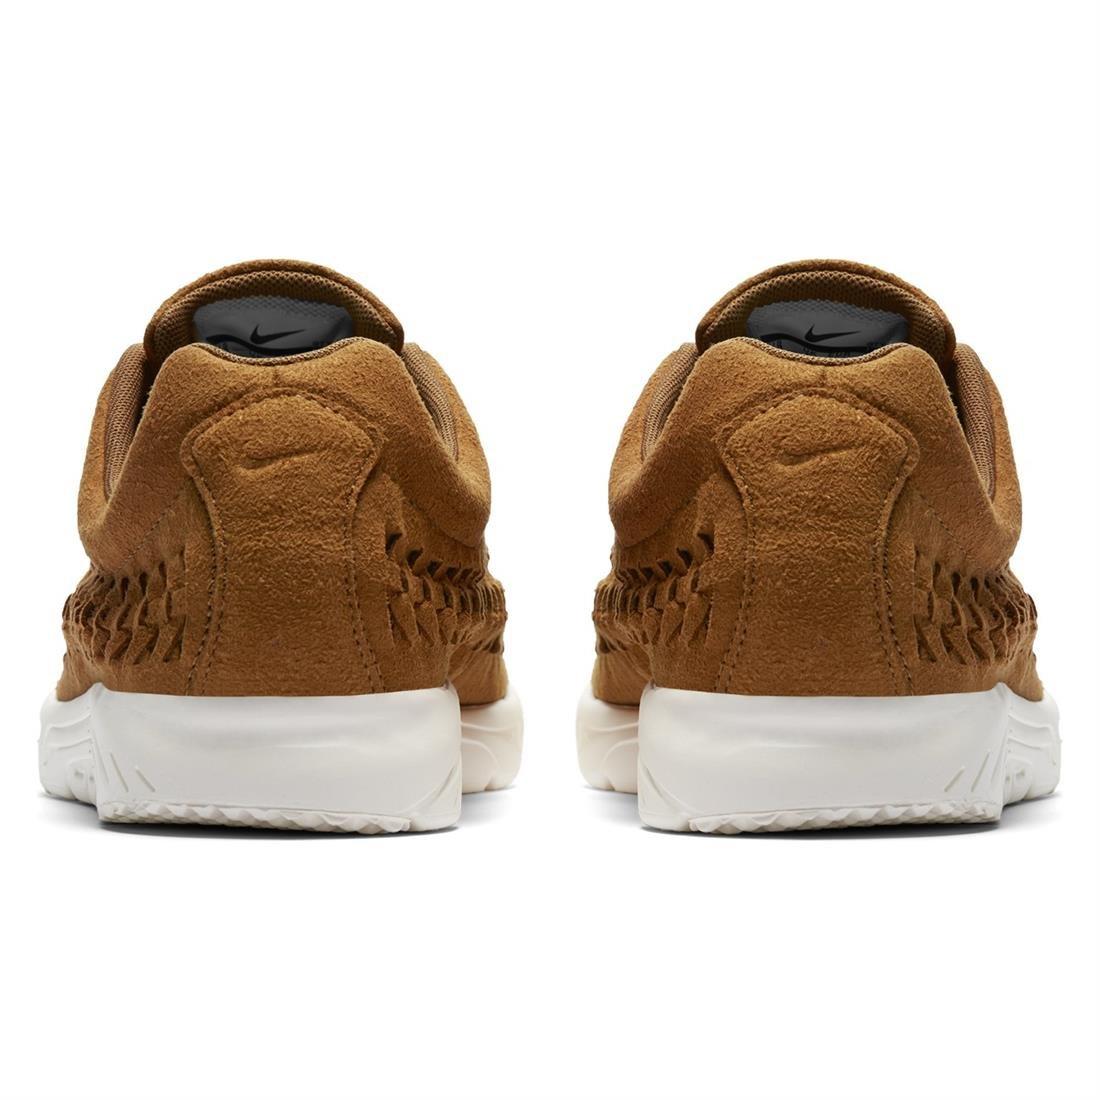 Nike Mens Mens Mens Mayfly Woven Braun Turnschuhe Low 1fb30d